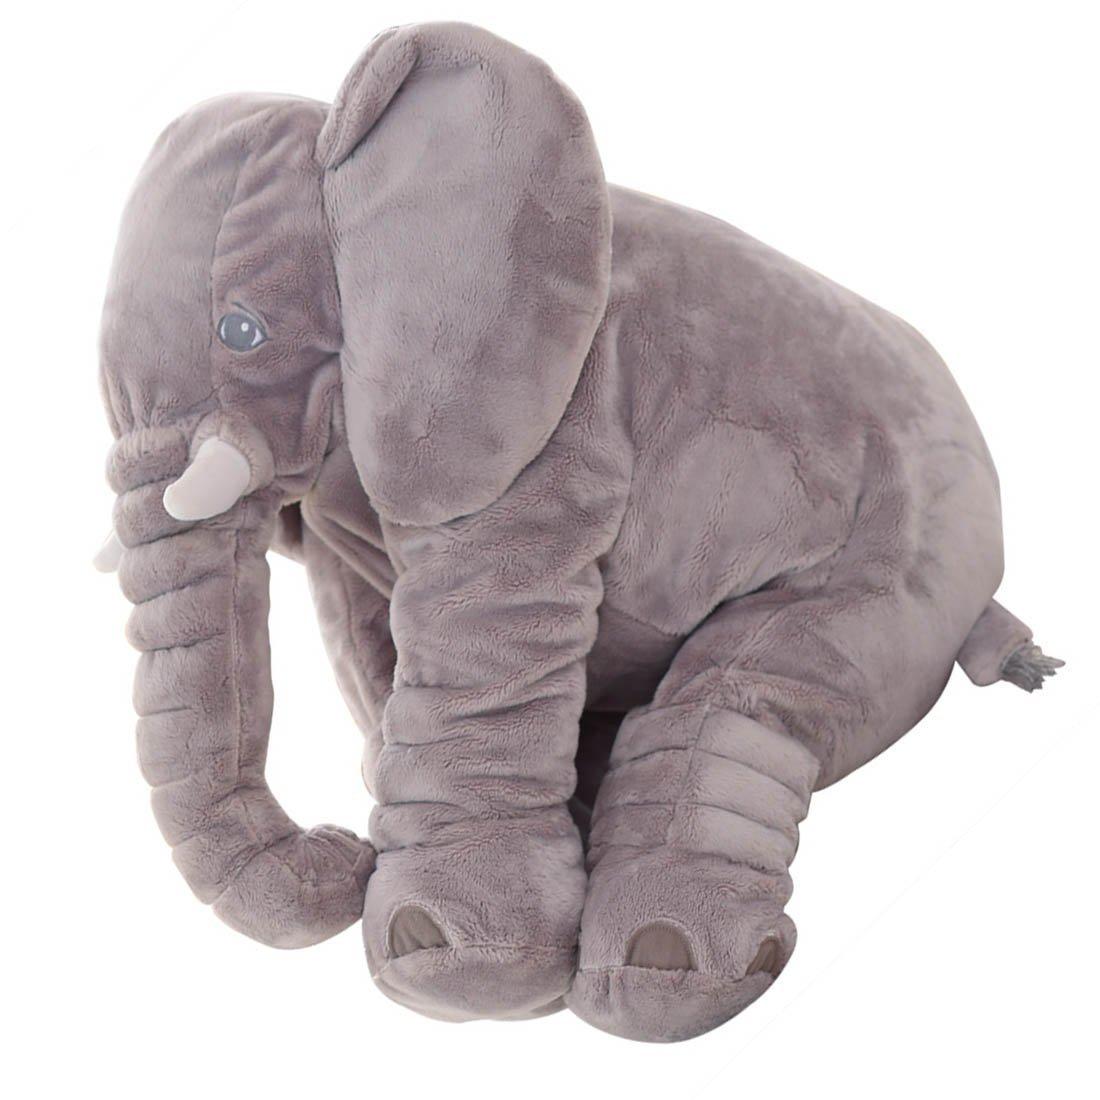 amazon com rainbow fox elephant stuffed plush toy cushion animals